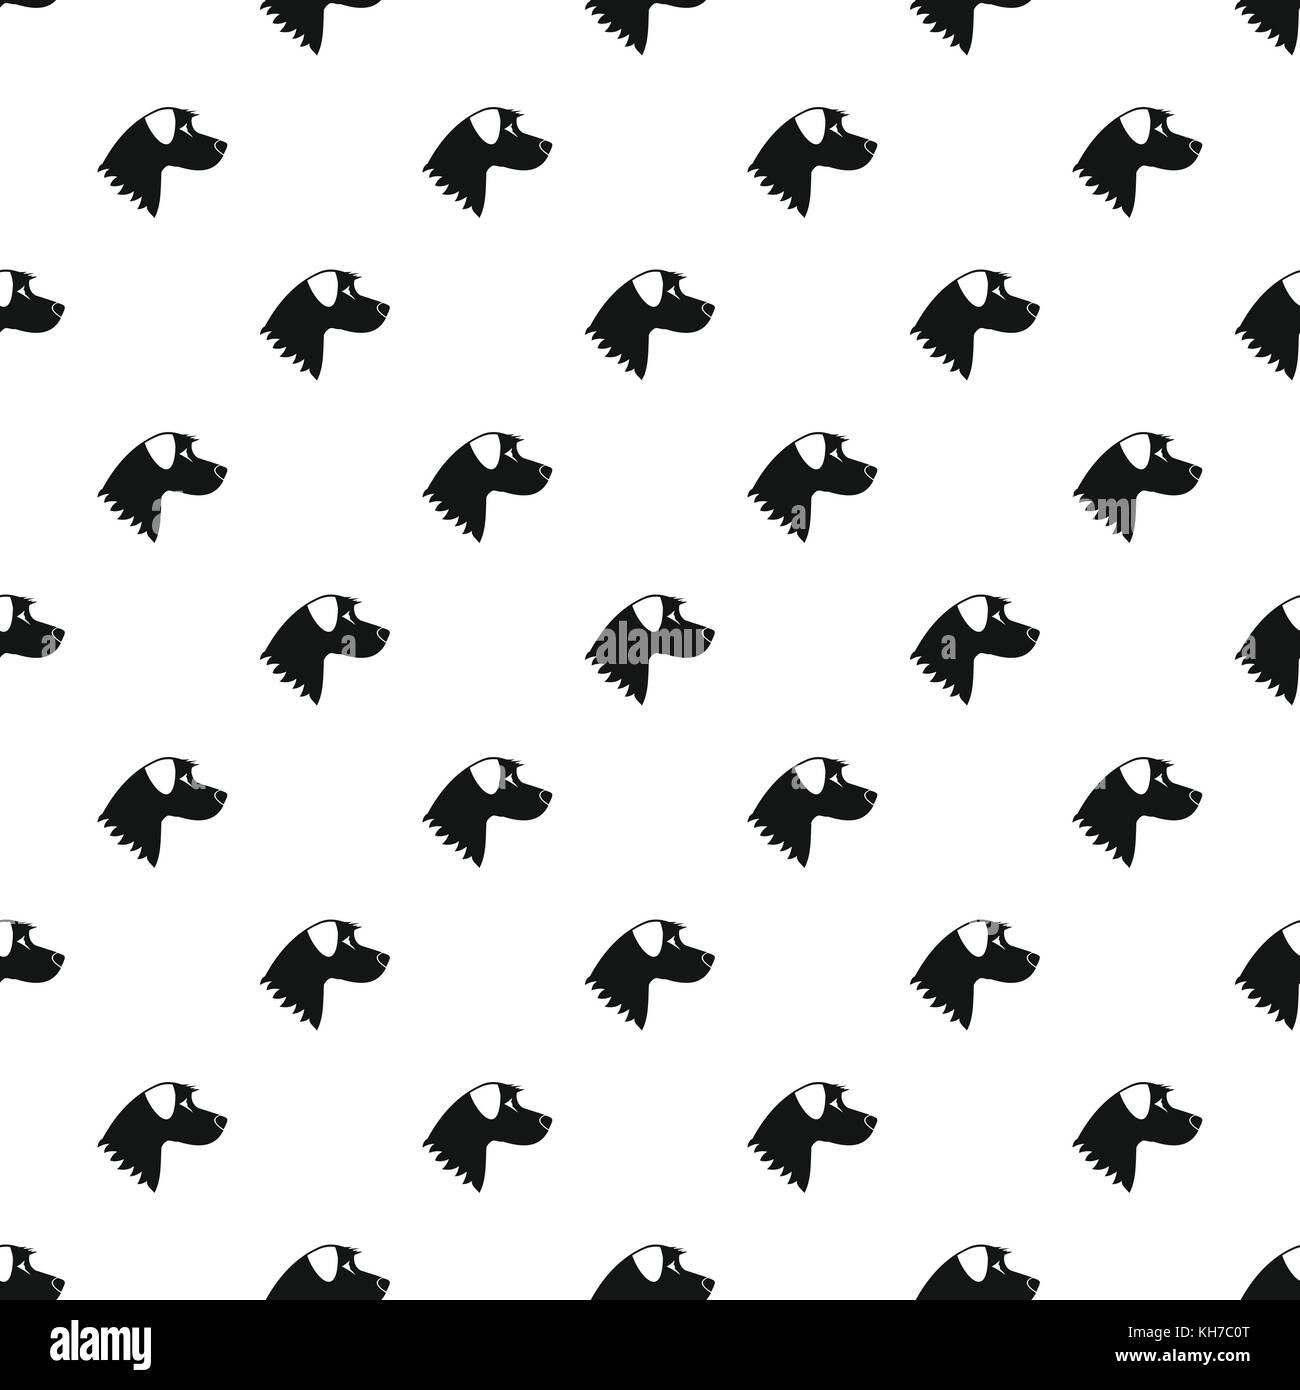 Dog pattern, simple style - Stock Image